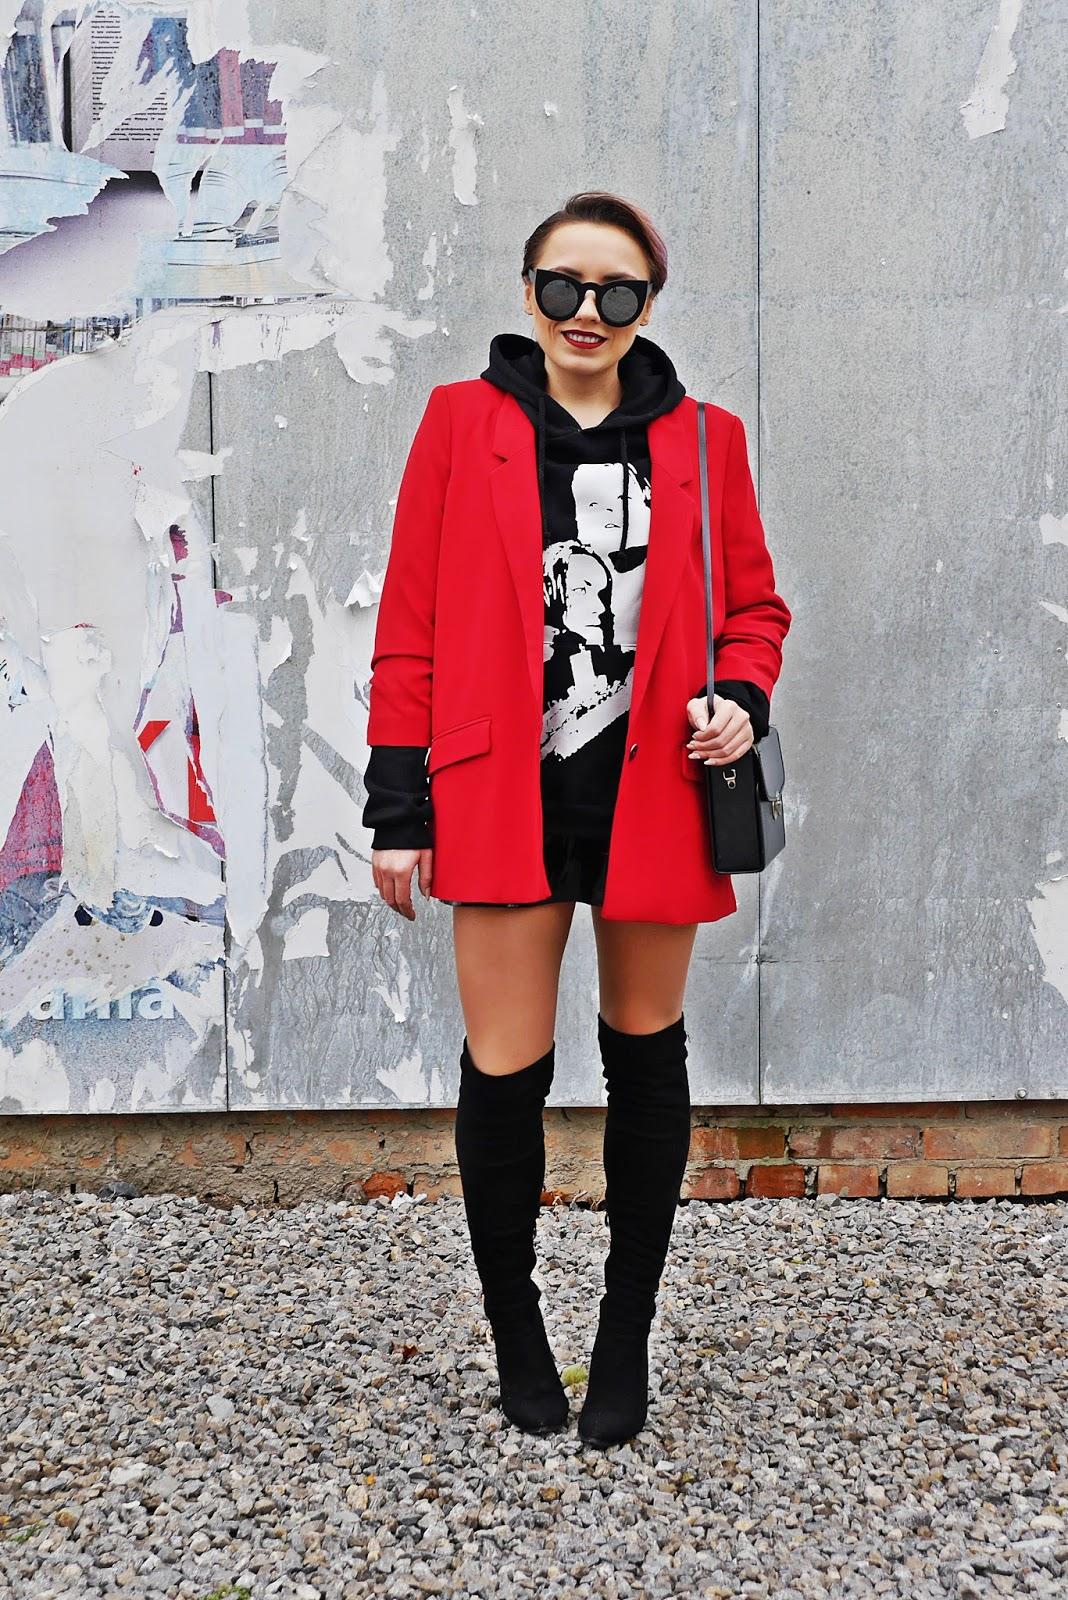 3_red_jacket_black_hoodie_titanic_karyn_blog_modowy_171017a